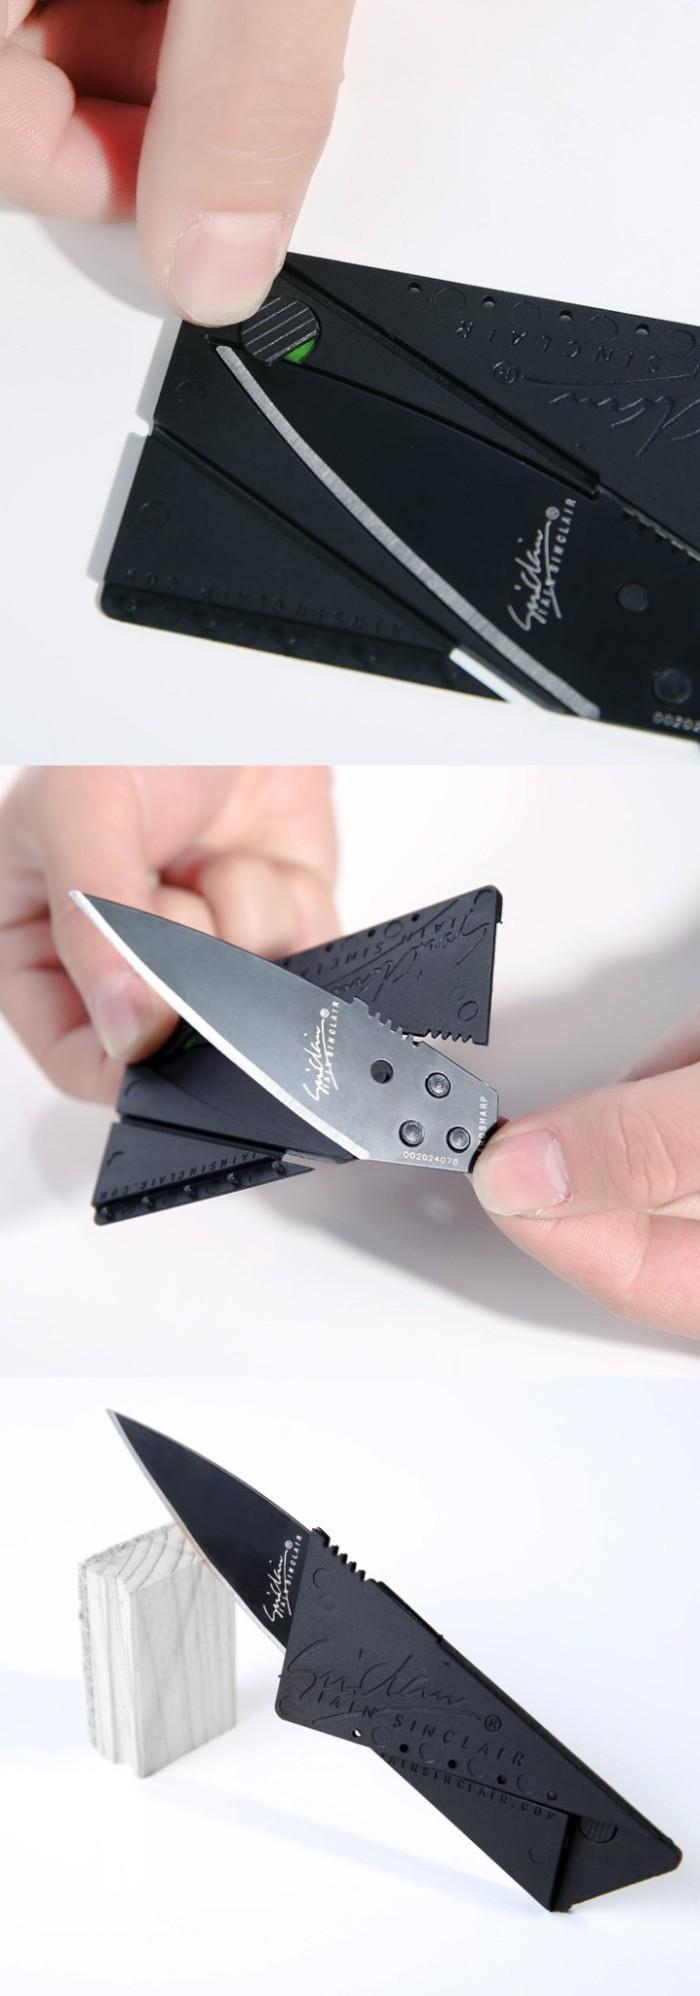 Pisau Lipat Mini Kecil Kartu Atm Credit Card Sinclair Knife Portable Bentuk 2 Cardsharp Hidden Survival Kit Outdoor Adventure 166